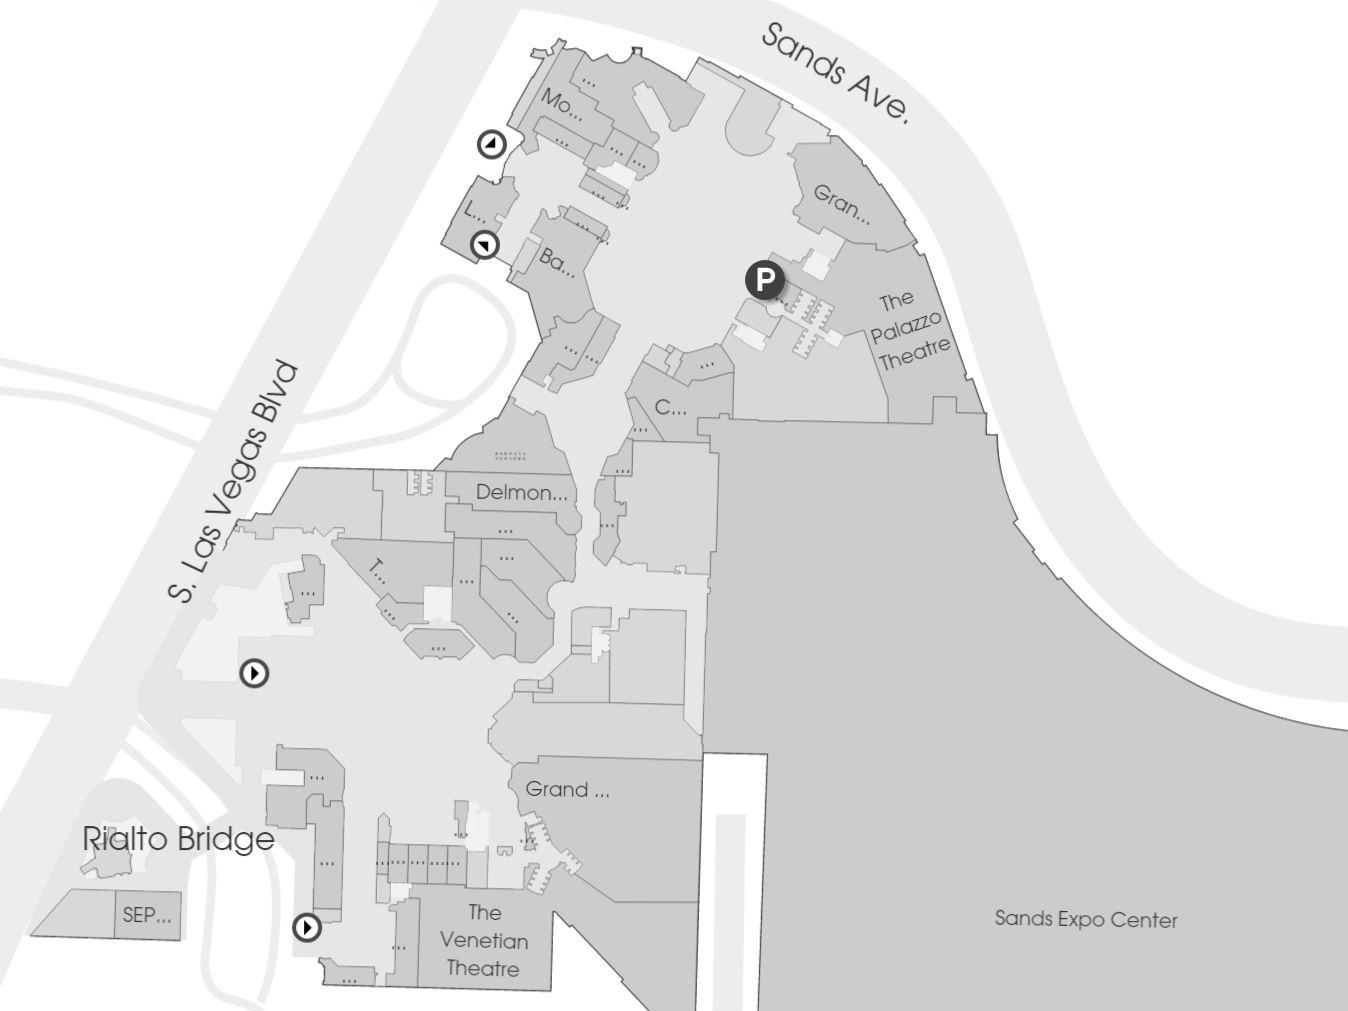 Grand Canal Shoppes Map Grand Canal Shoppes | VIP Dine 4Less Card Grand Canal Shoppes Map